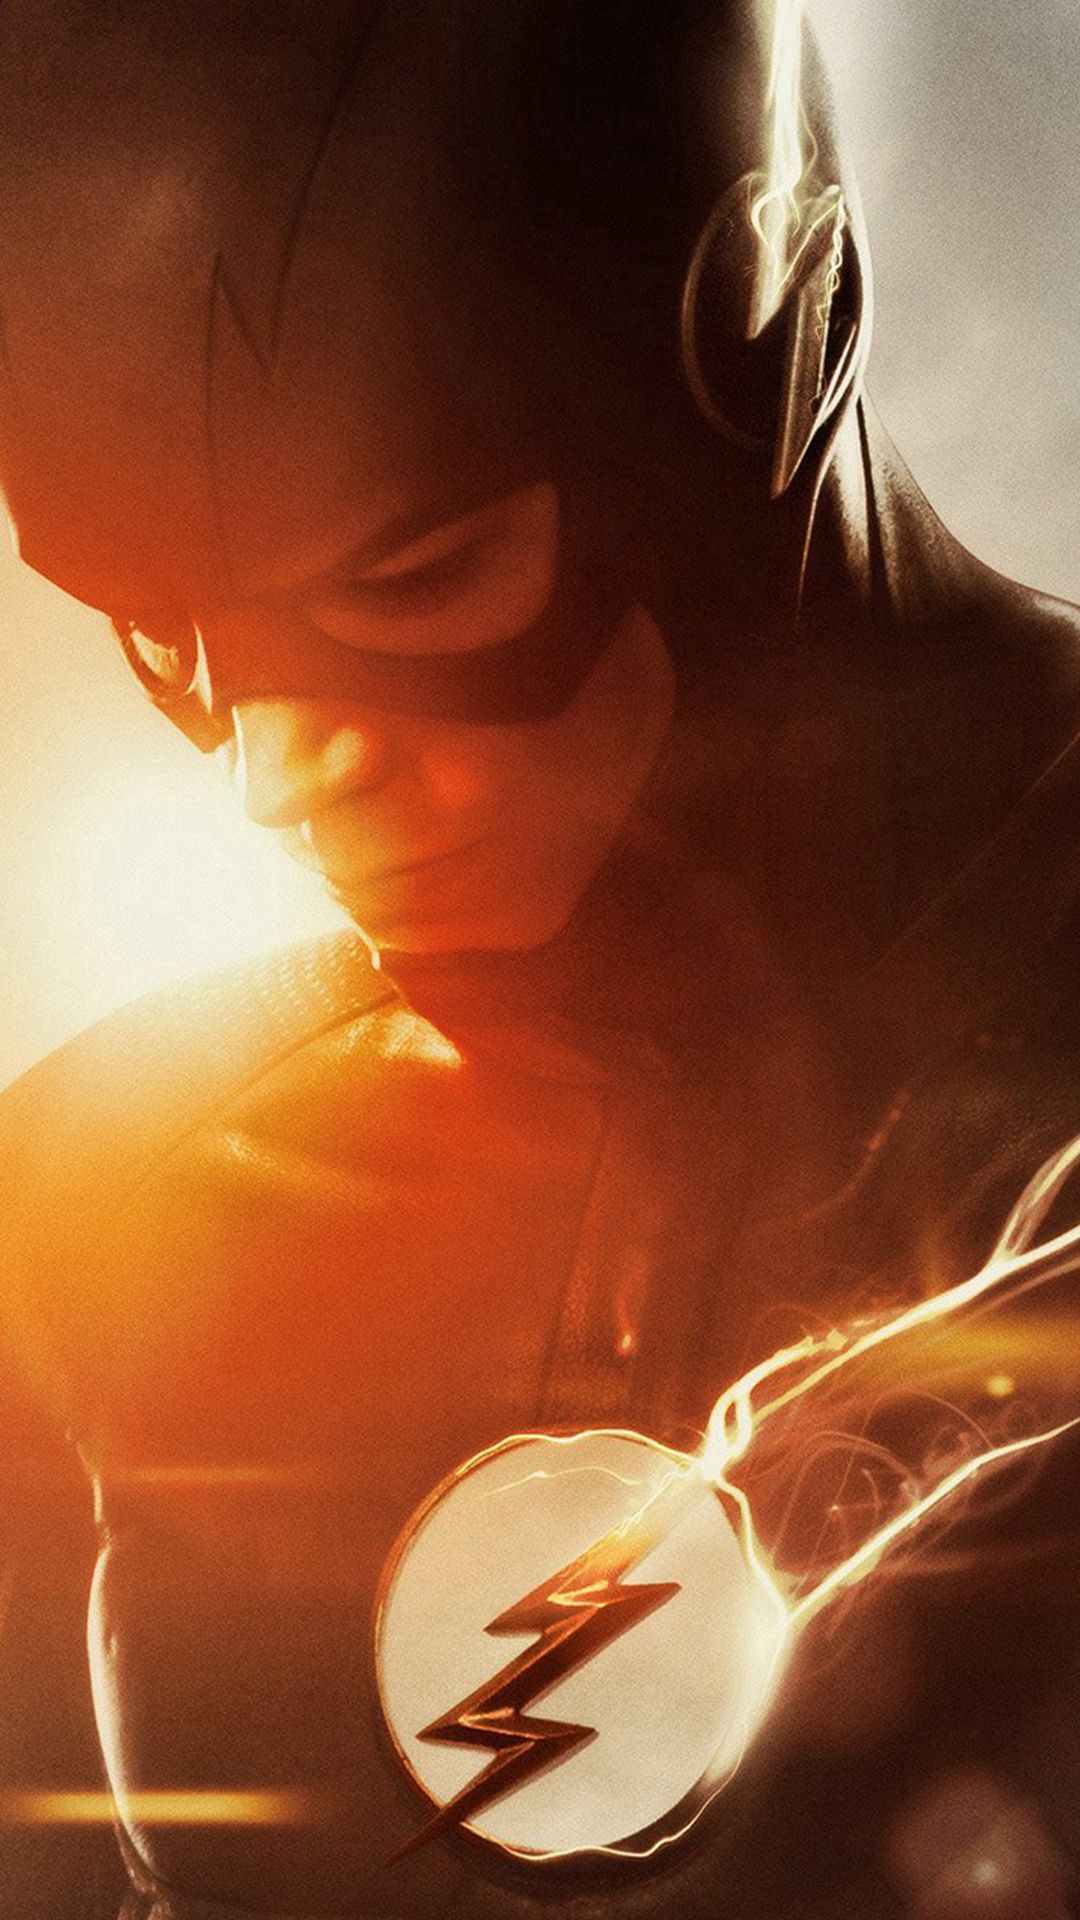 The Flash Tv Series Hero Film Art iPhone 8 Wallpapers